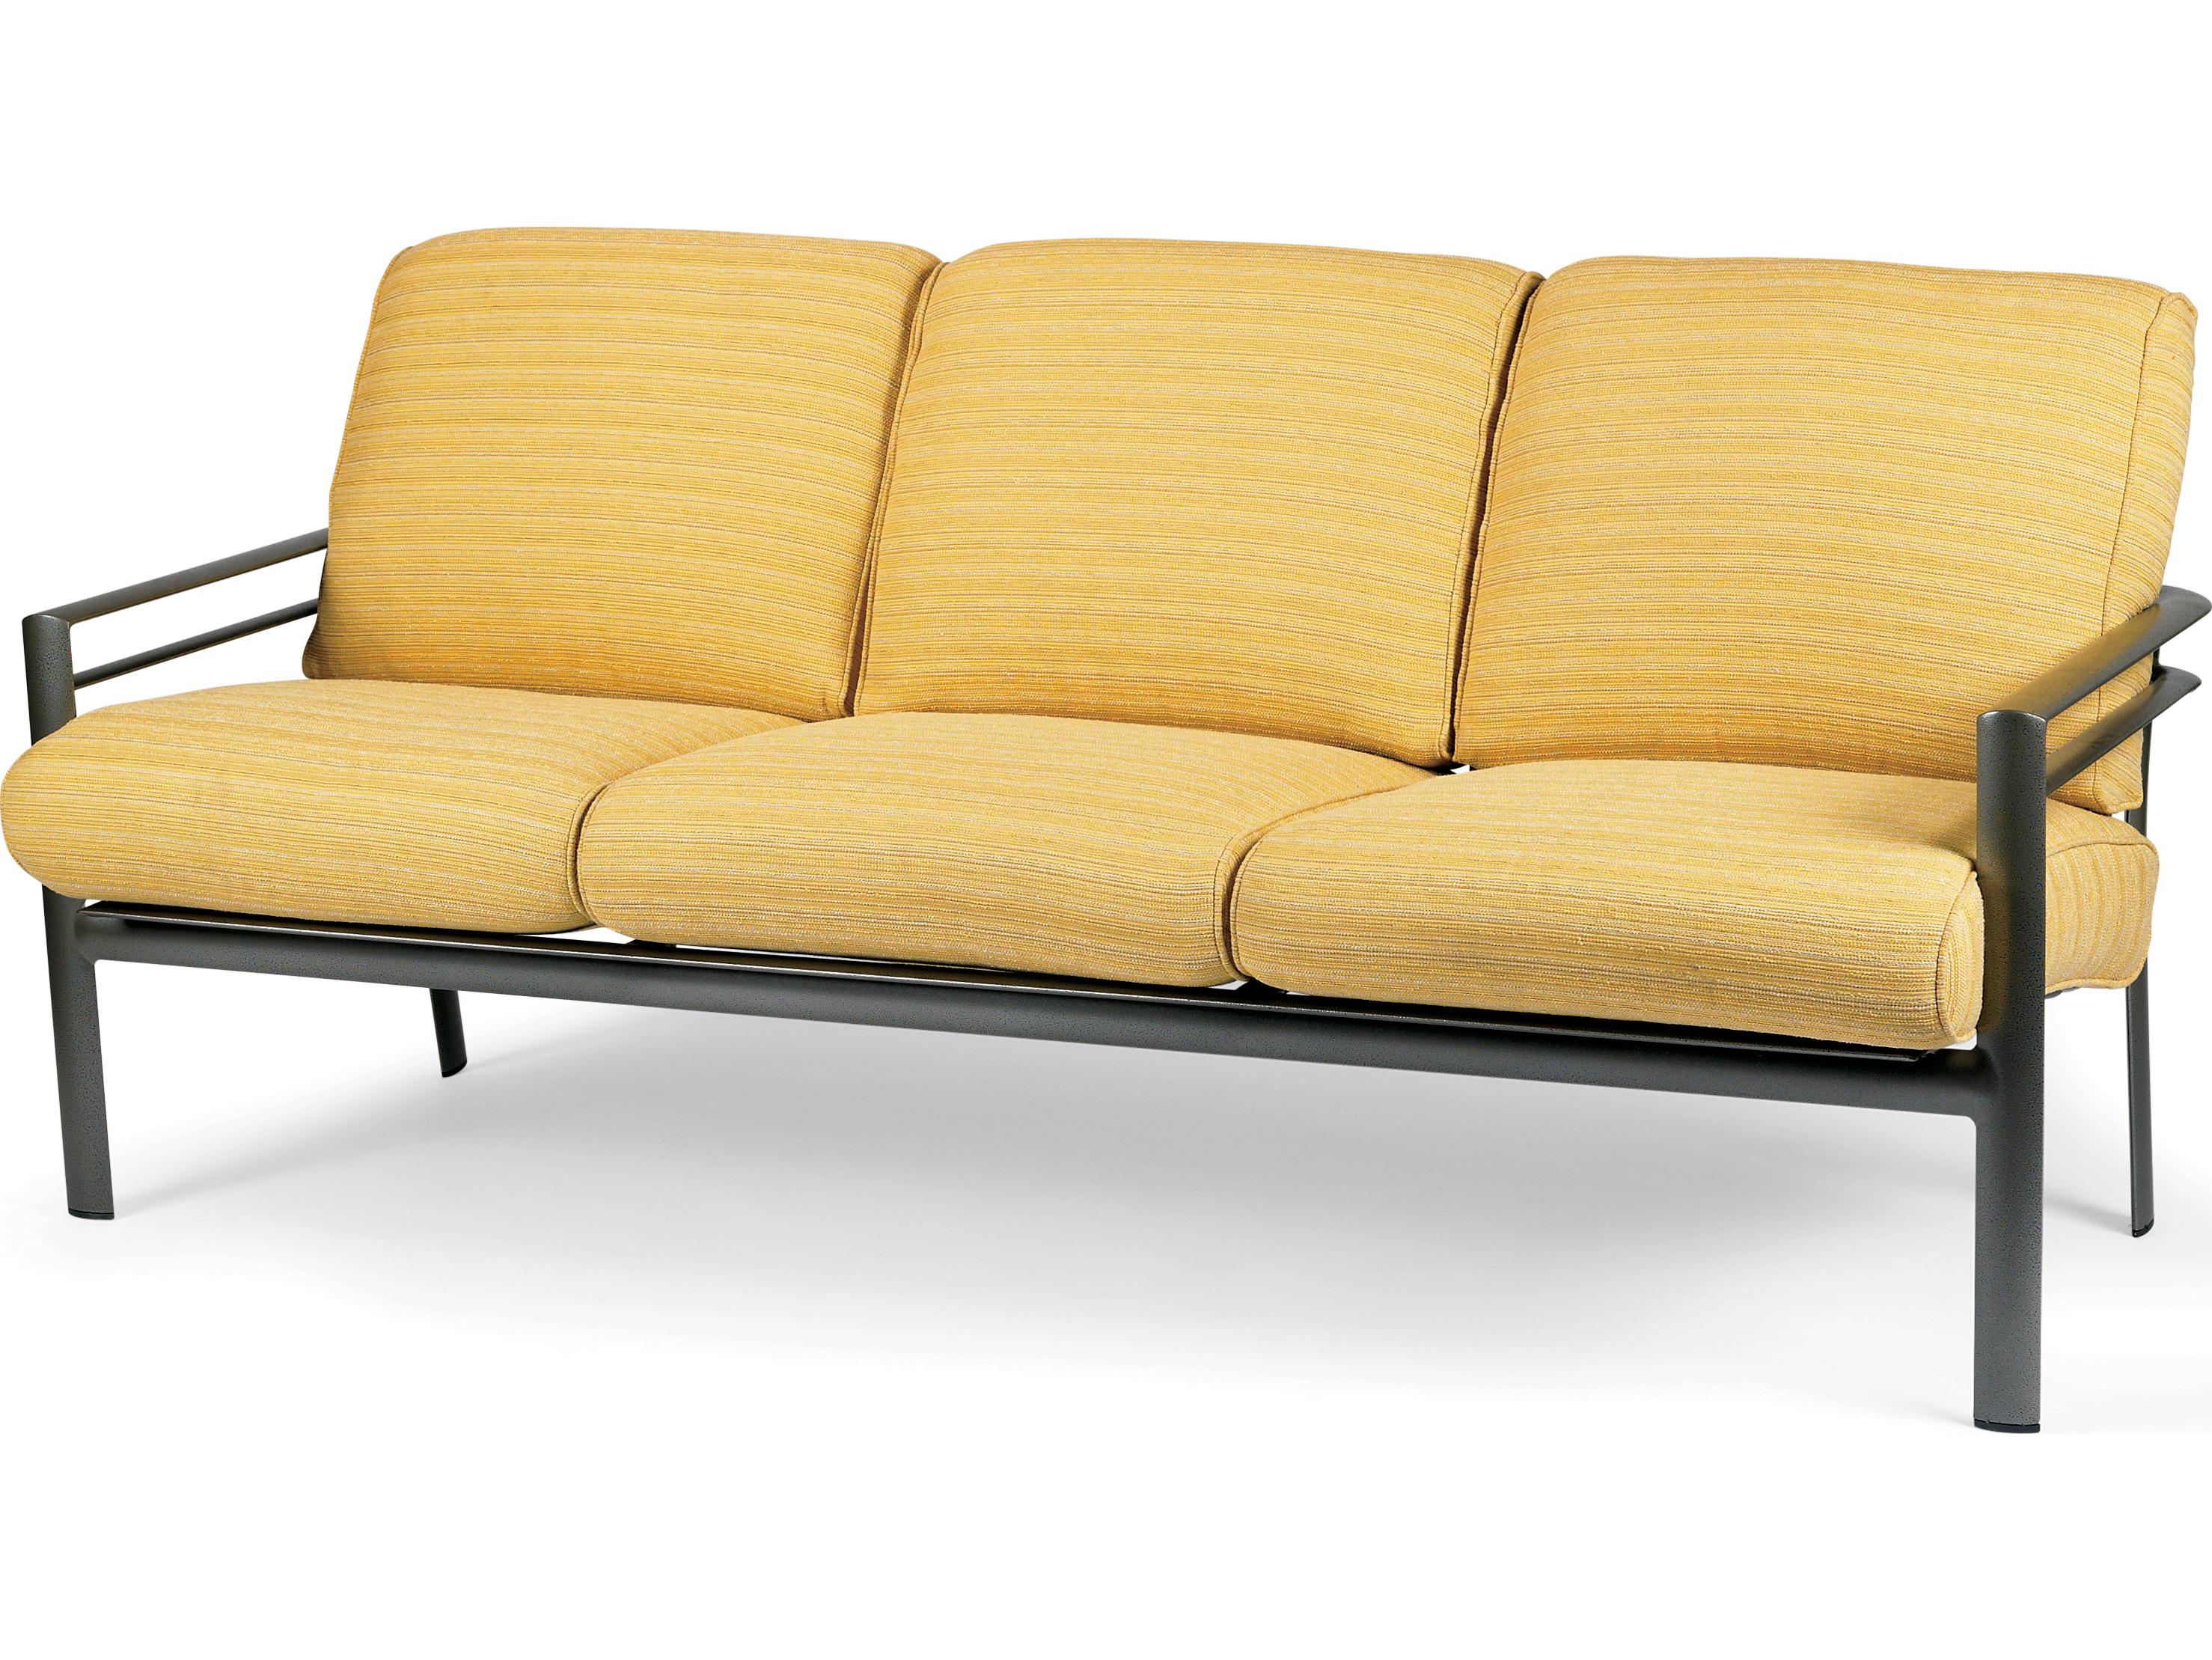 Winston Southern Cay Sling Aluminum Armless Chaise Lounge: Winston Southern Cay Cushion Aluminum Sofa